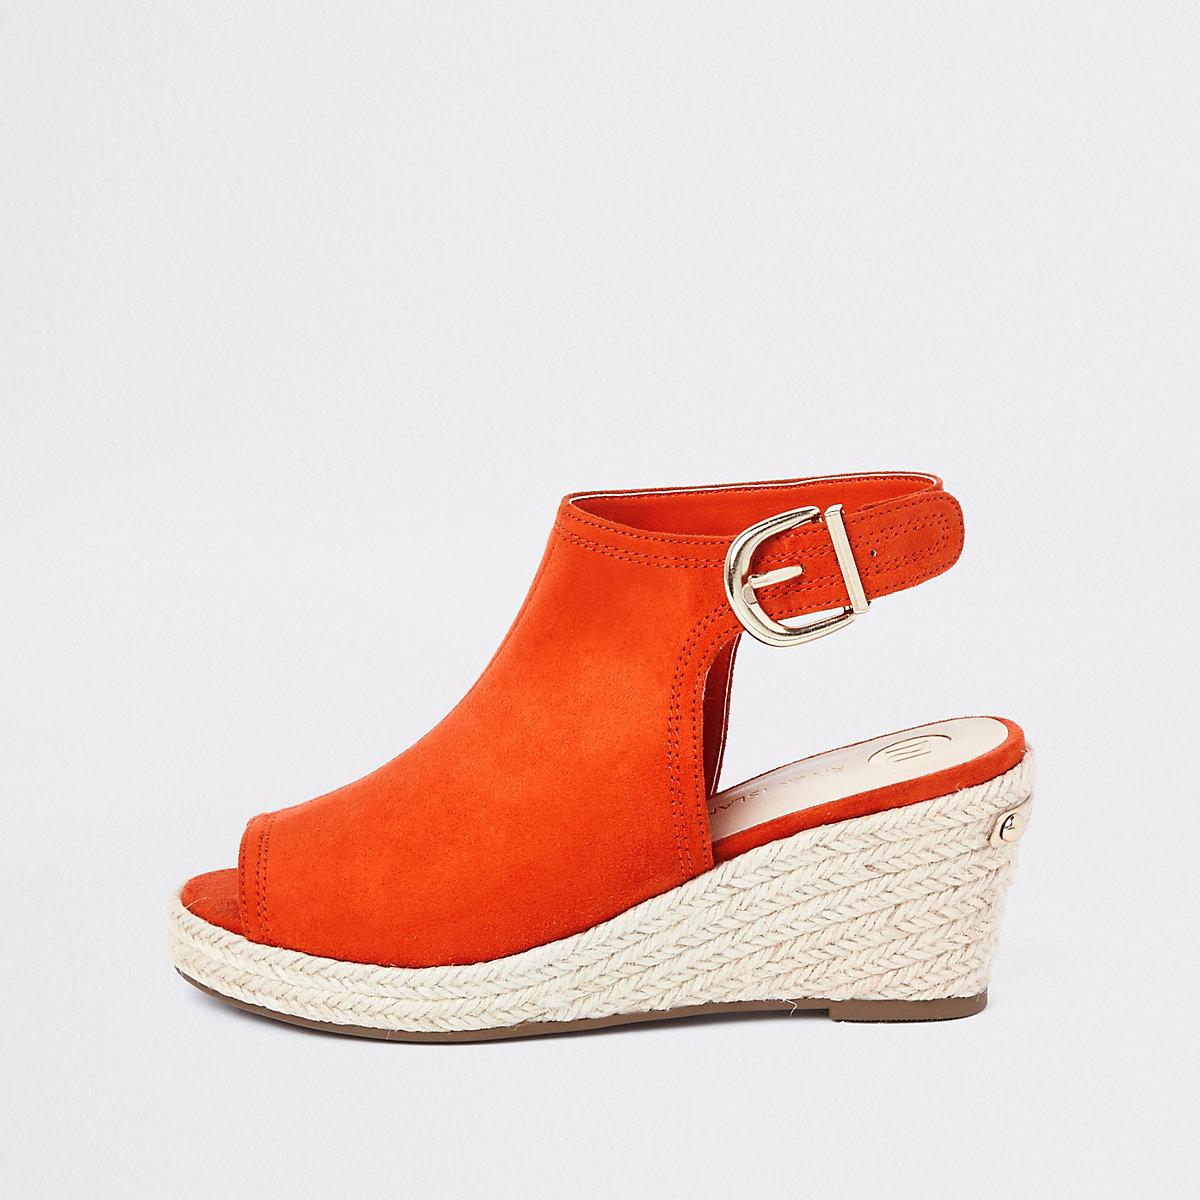 Girls orange espadrille peep toe wedges